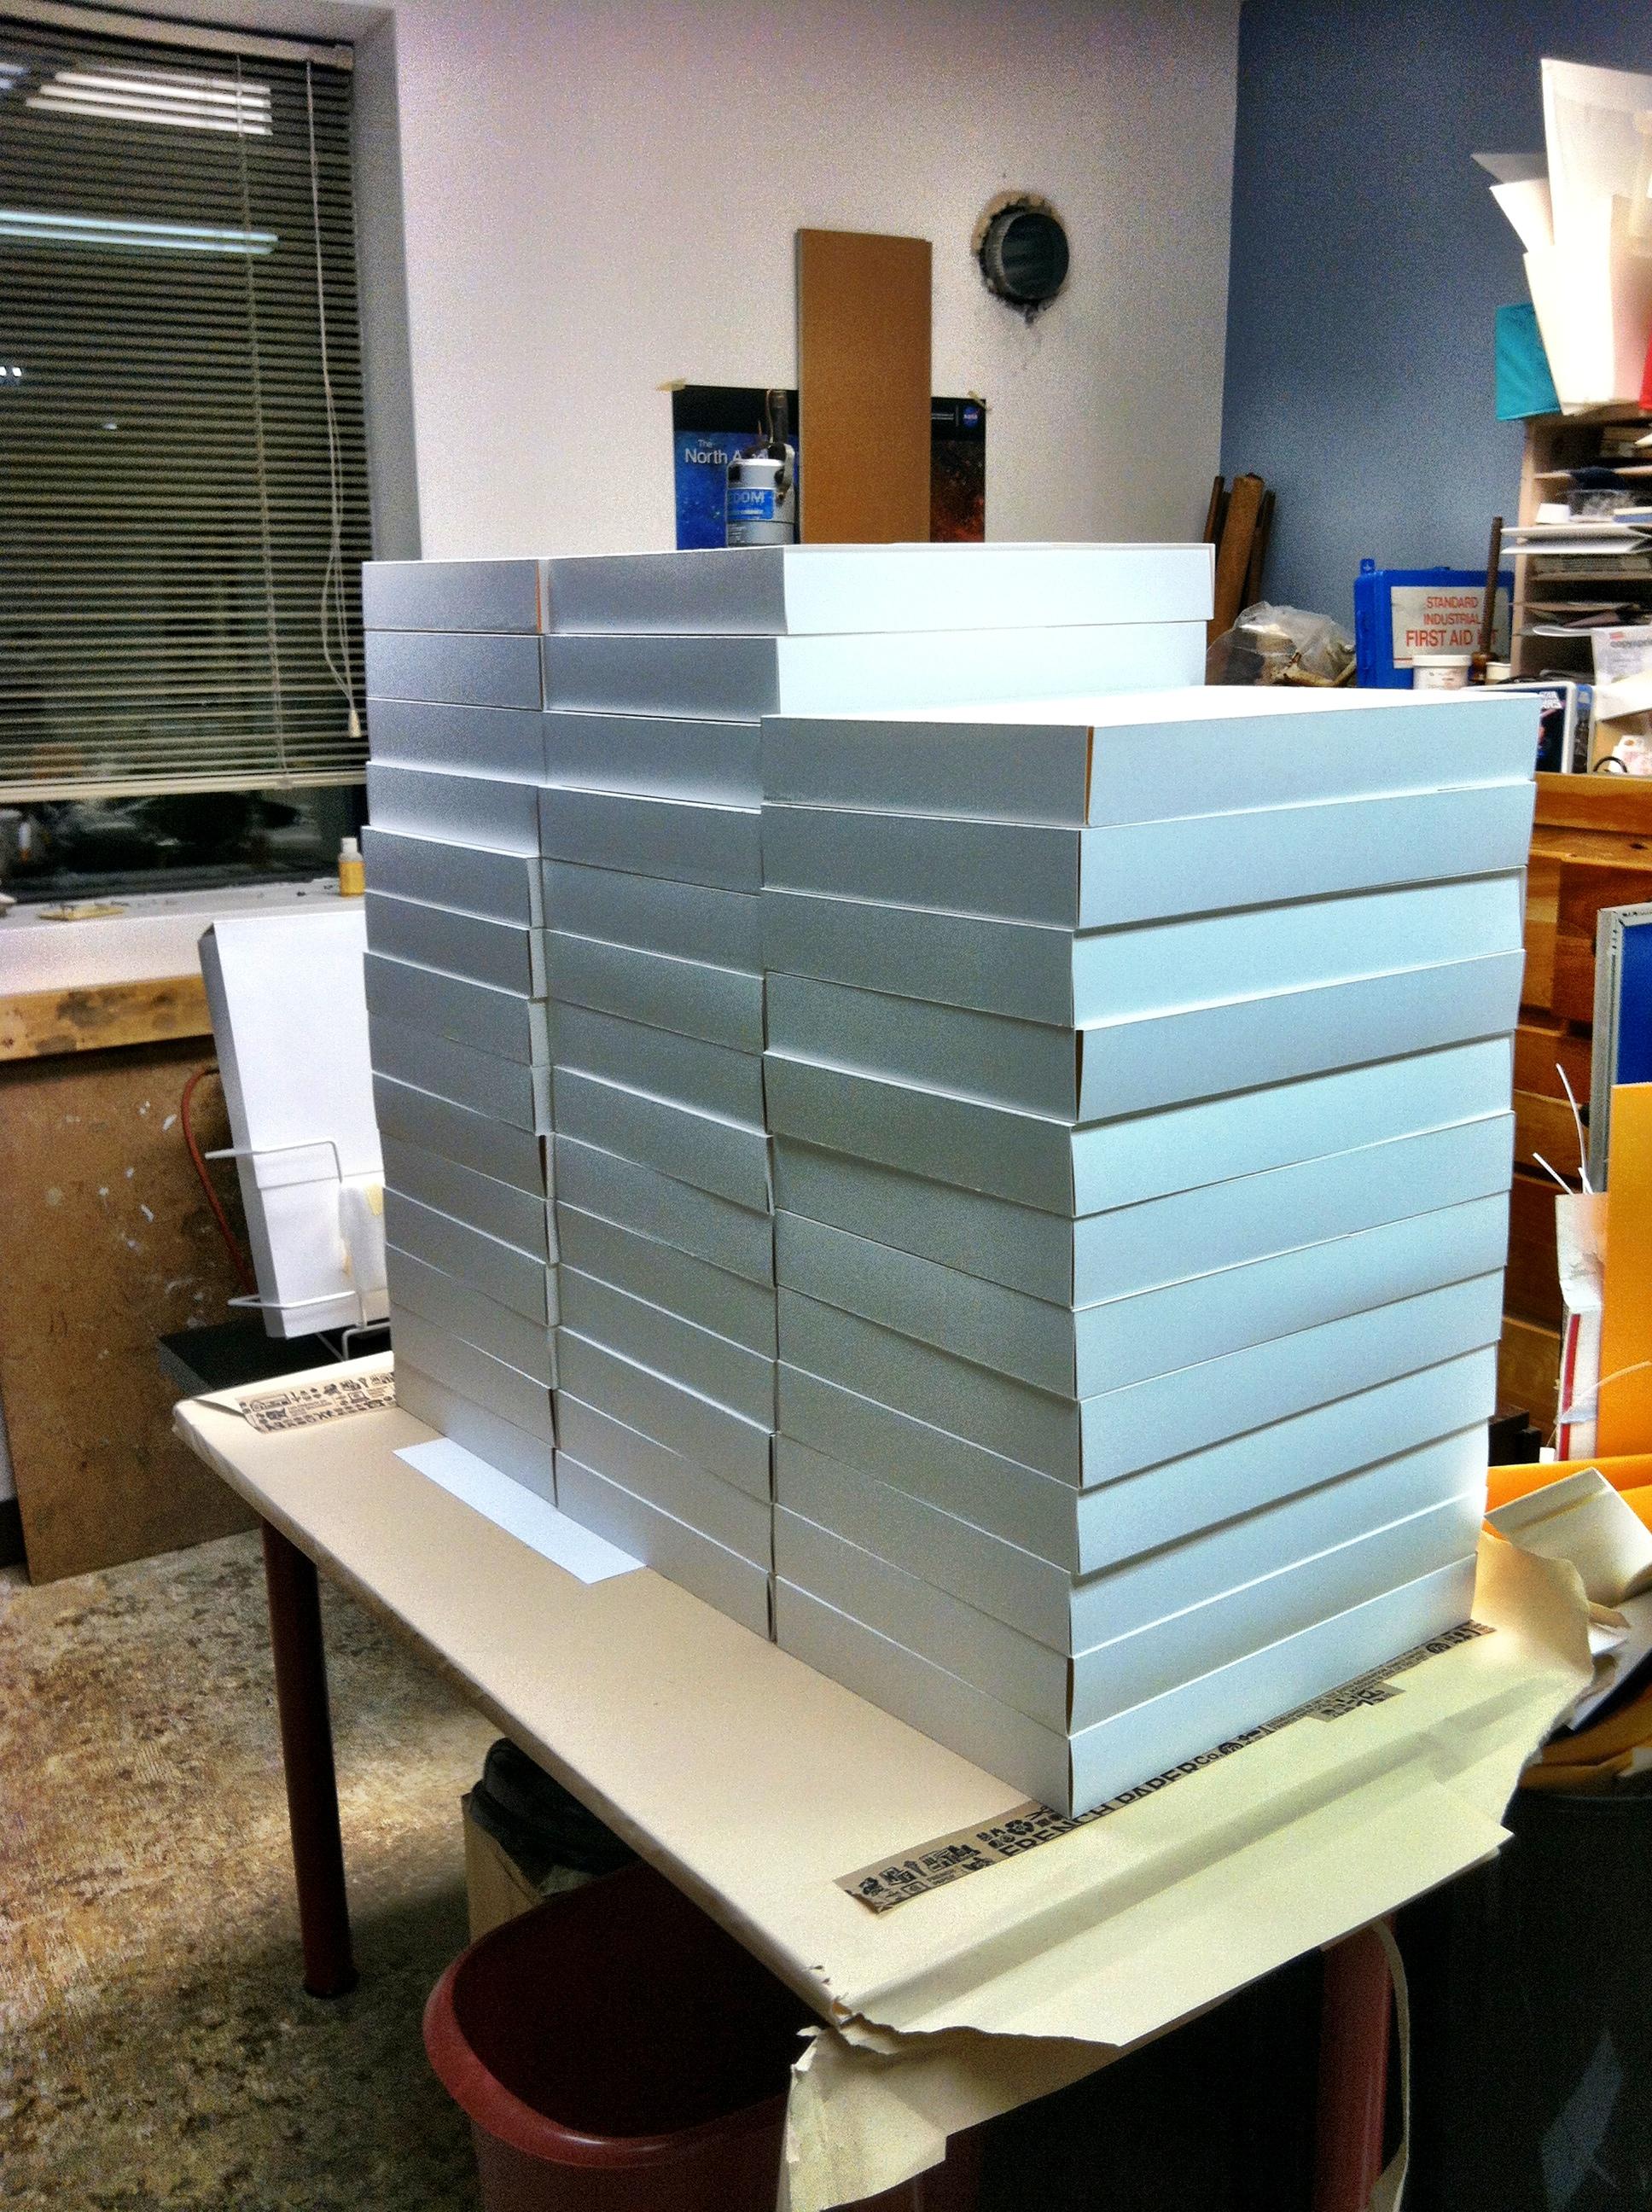 dski-design-paper-boxes-4